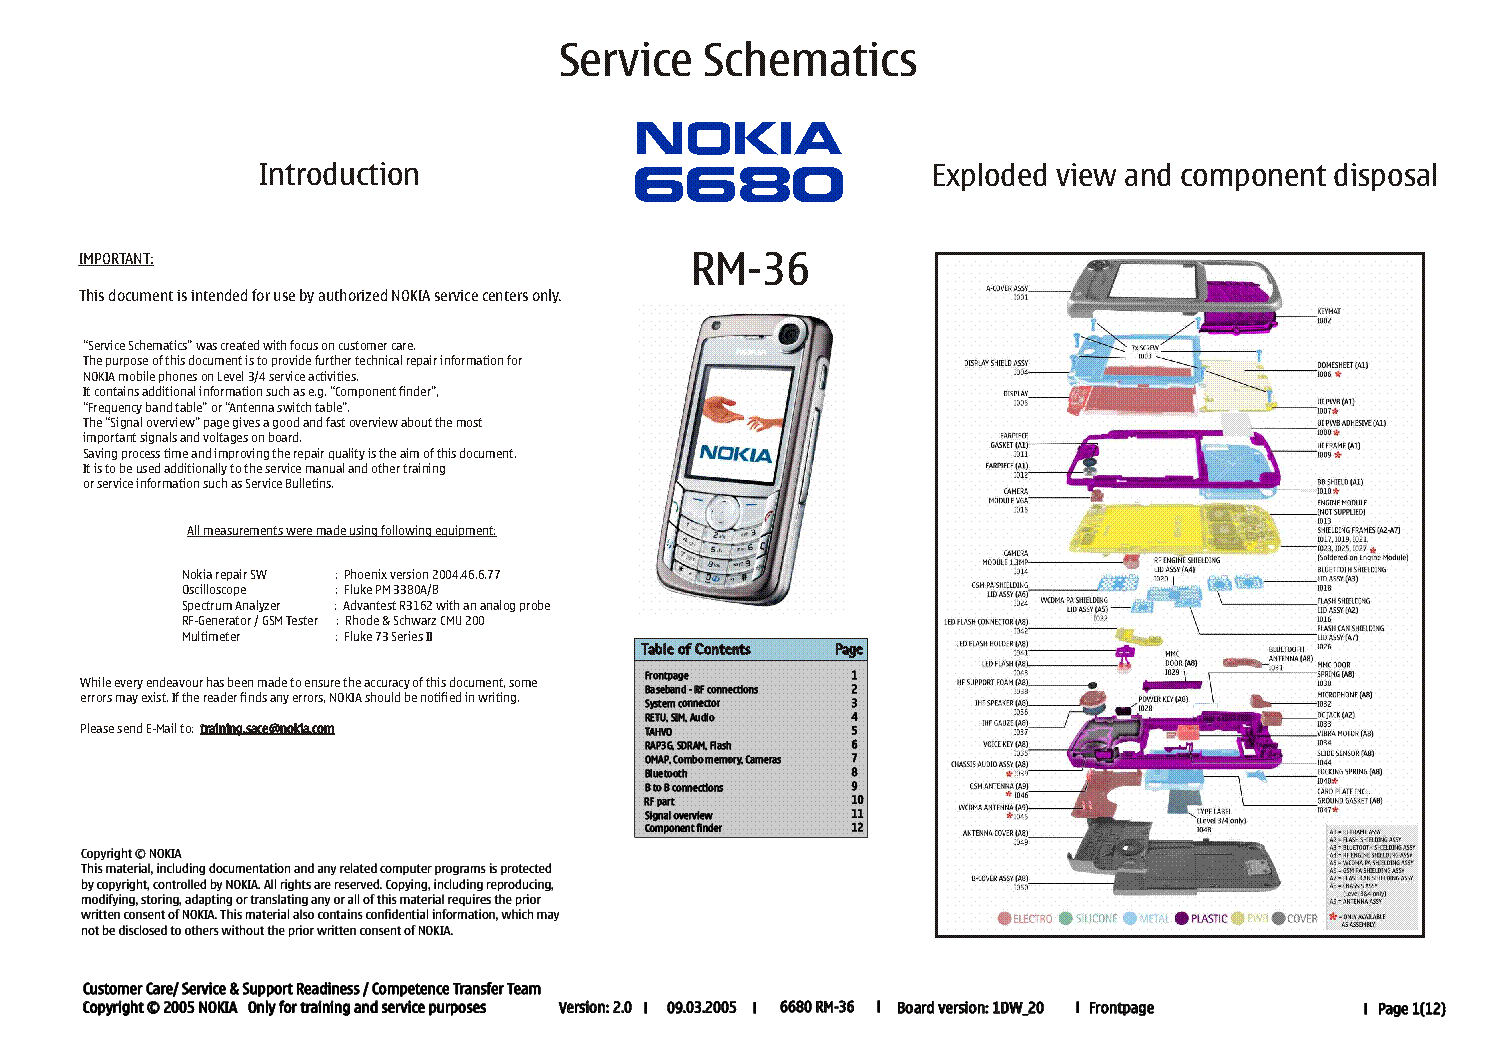 nokia 6680 rm 36 service schematics service manual download rh elektrotanya com nokia 6680 service manual nokia 6680 user manual.pdf